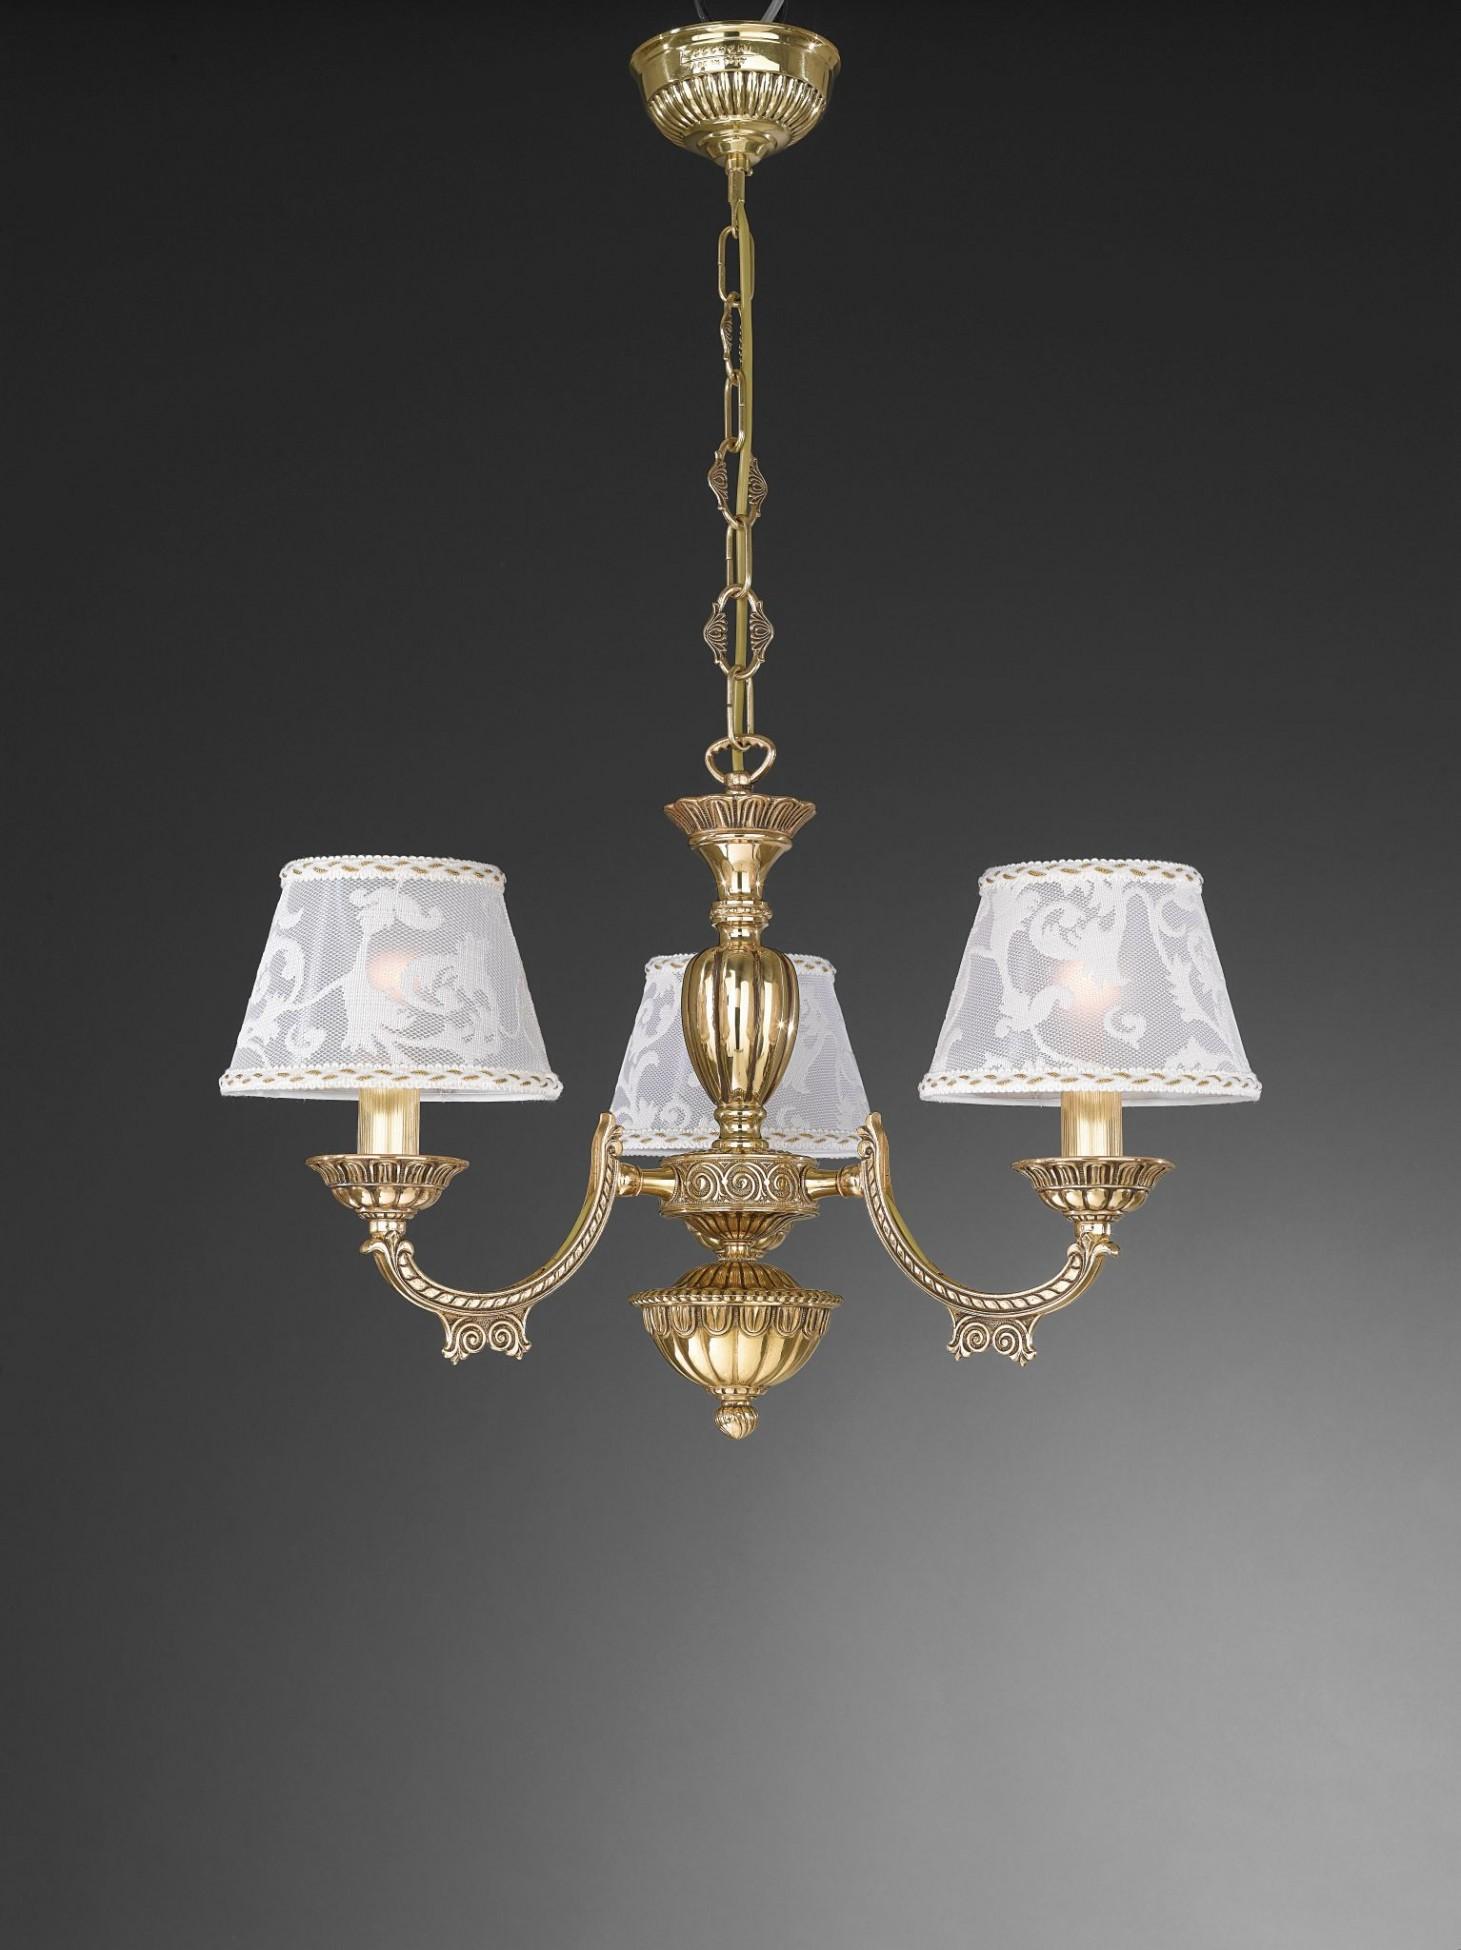 kronleuchter aus goldenen messing mit lampenschirm 3. Black Bedroom Furniture Sets. Home Design Ideas